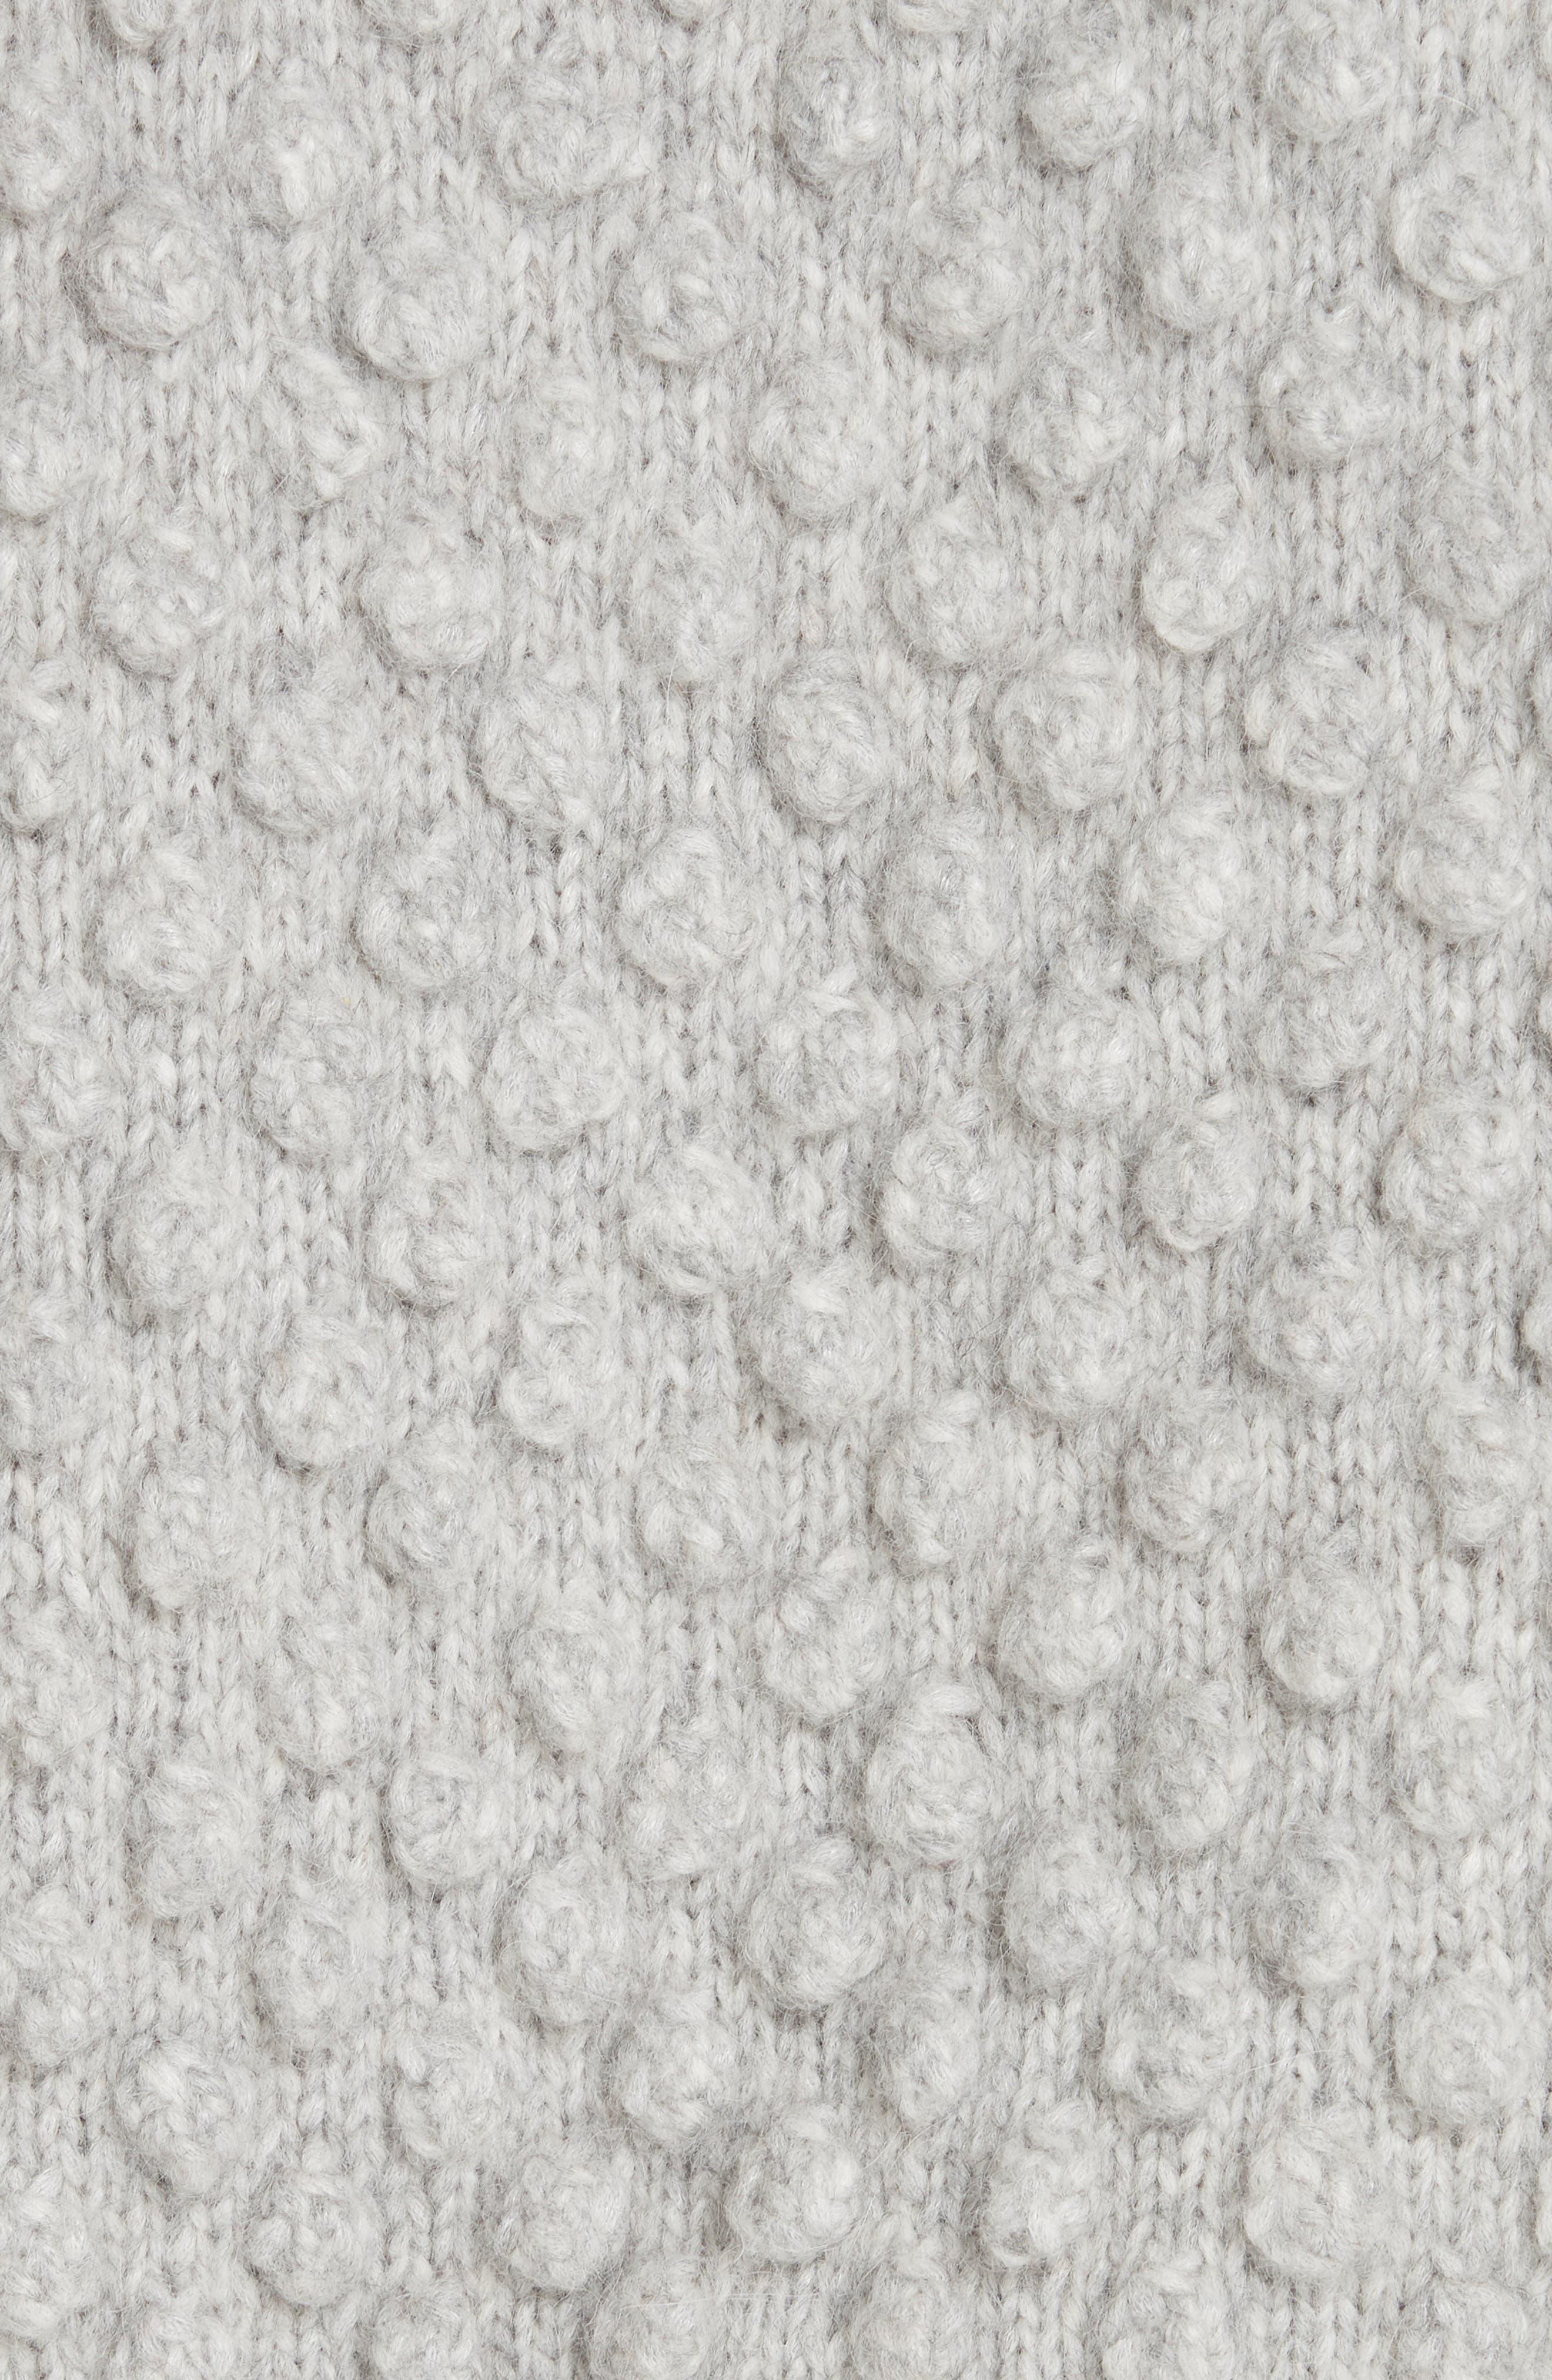 Camilla Baby Alpaca Blend Sweater,                             Alternate thumbnail 5, color,                             PALE MELANGE GREY